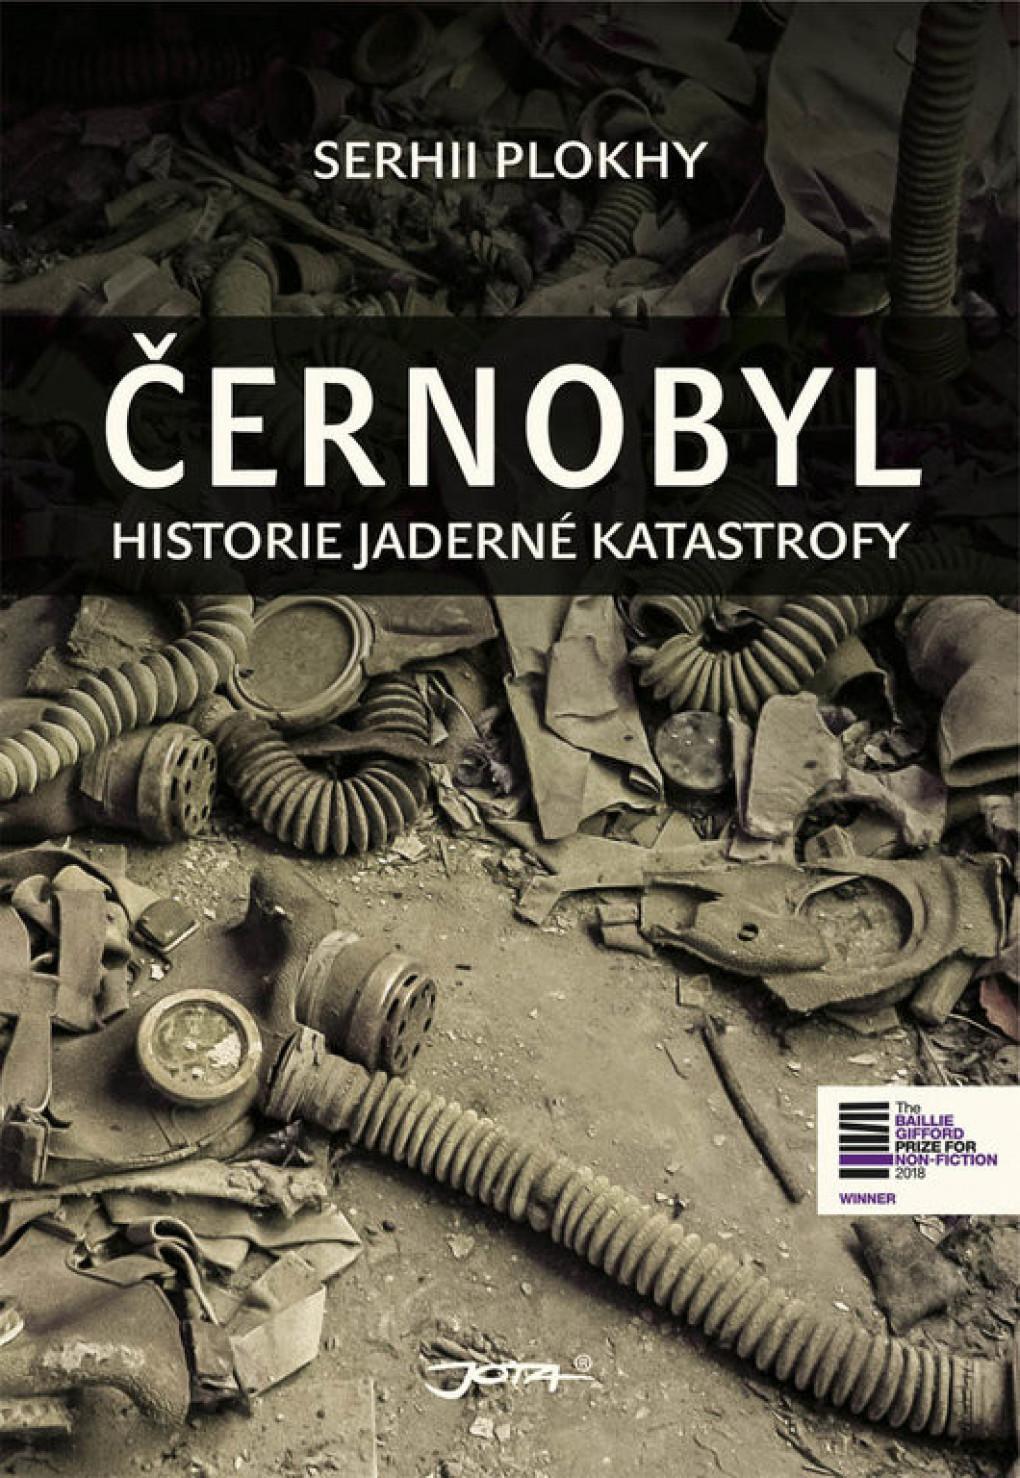 ernobyl.jpg